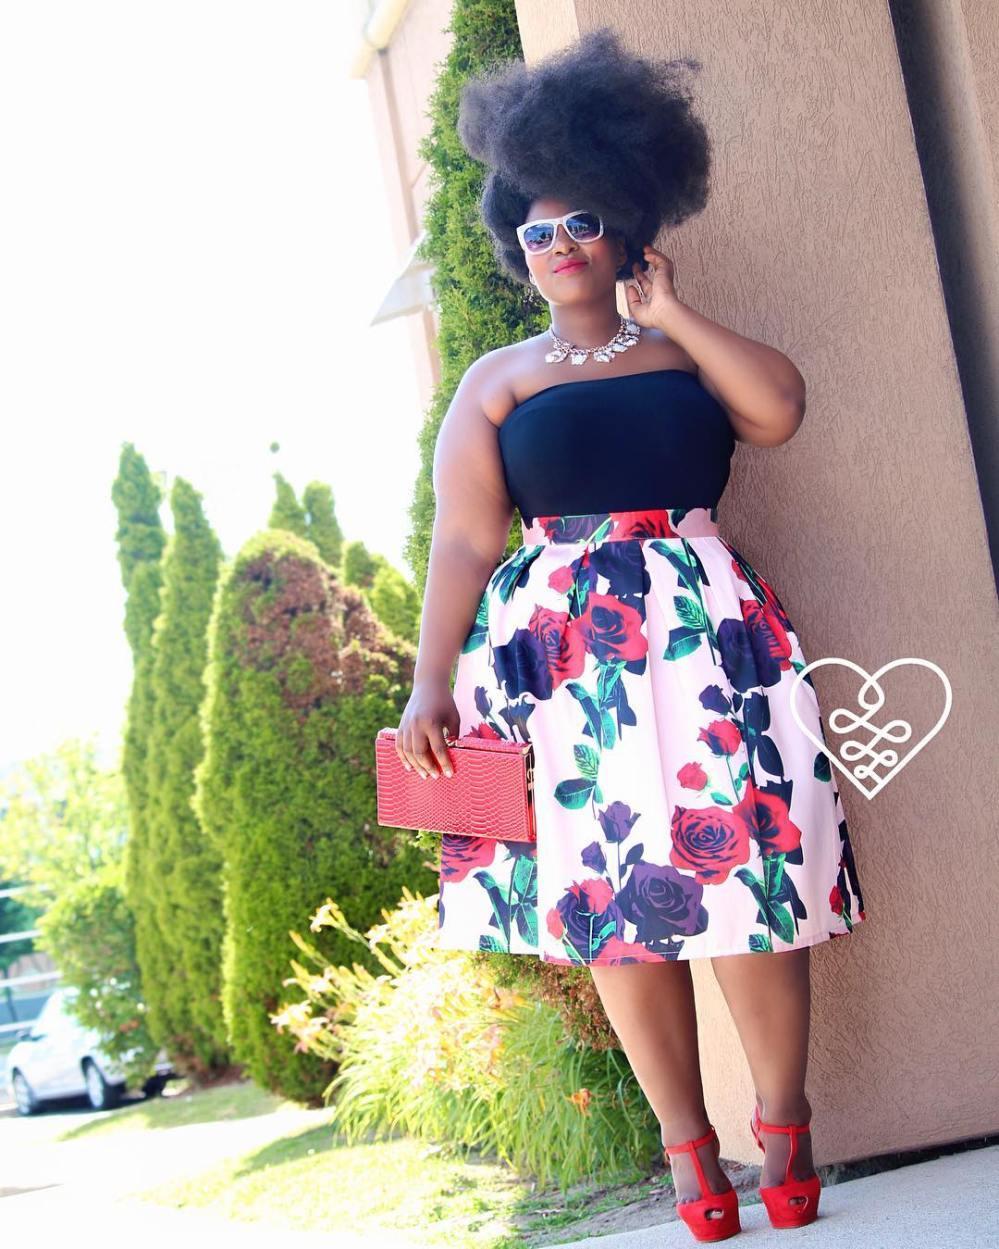 nakitende-esther_curvy-crush-wednesday_theafricanista.com (5).jpg